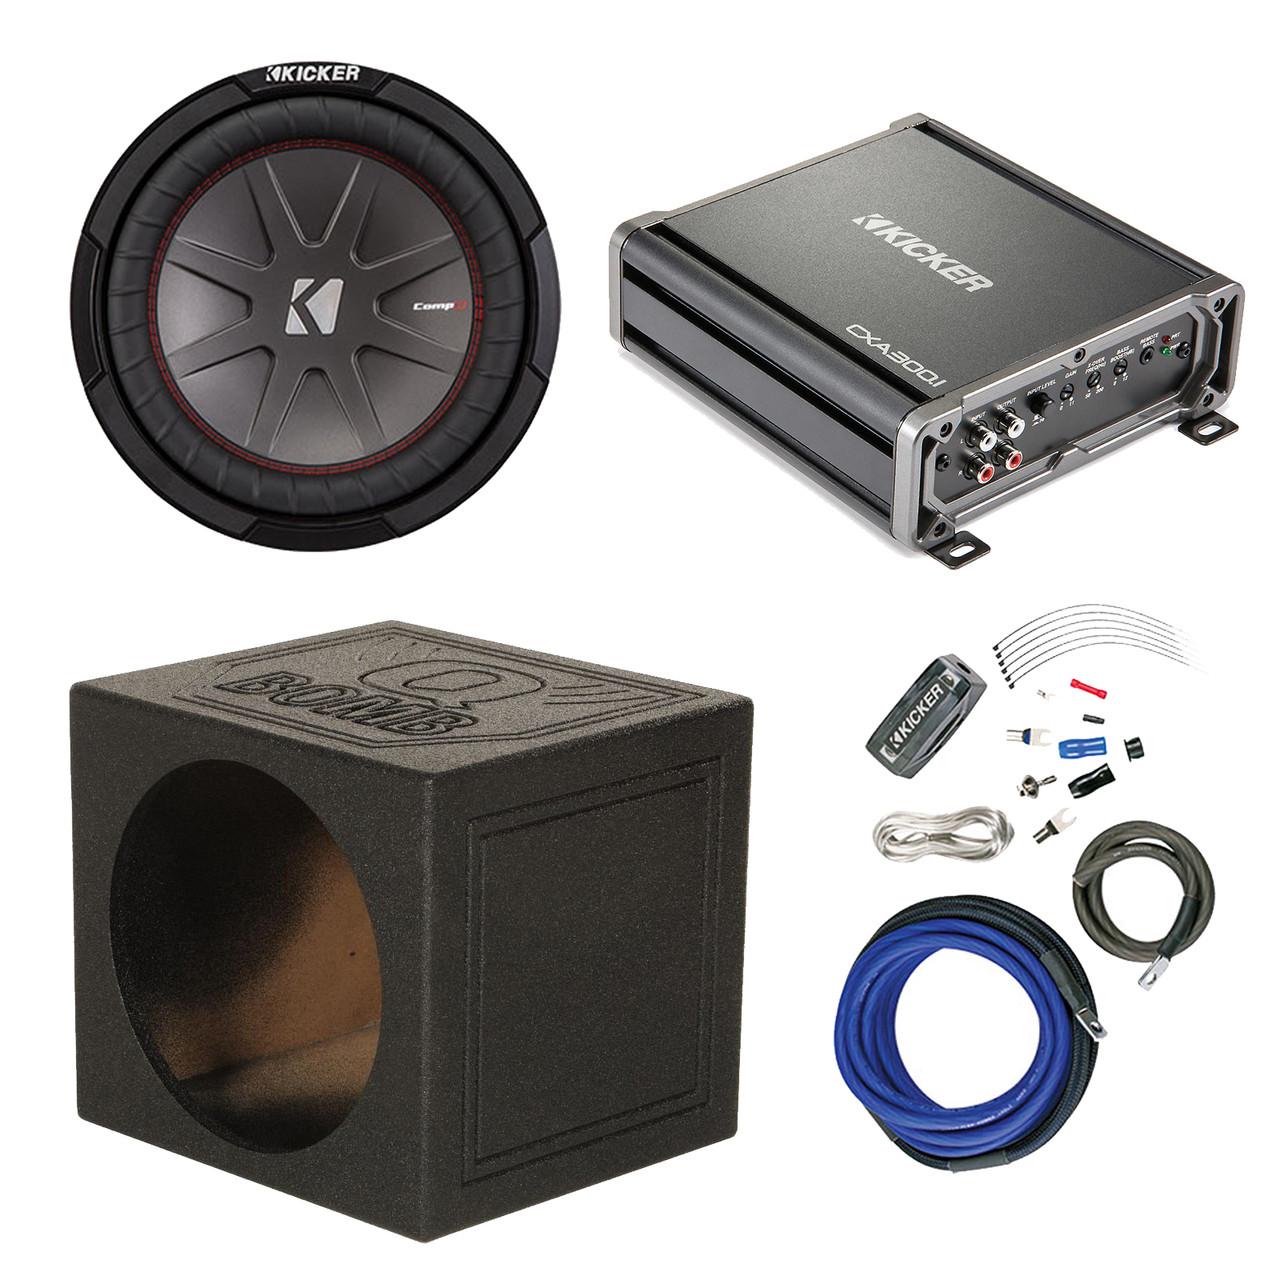 Astonishing Kicker 10 Subwoofers 600Watt Amp Qpower 10 Ported Sub Box Amp Wiring Digital Resources Indicompassionincorg